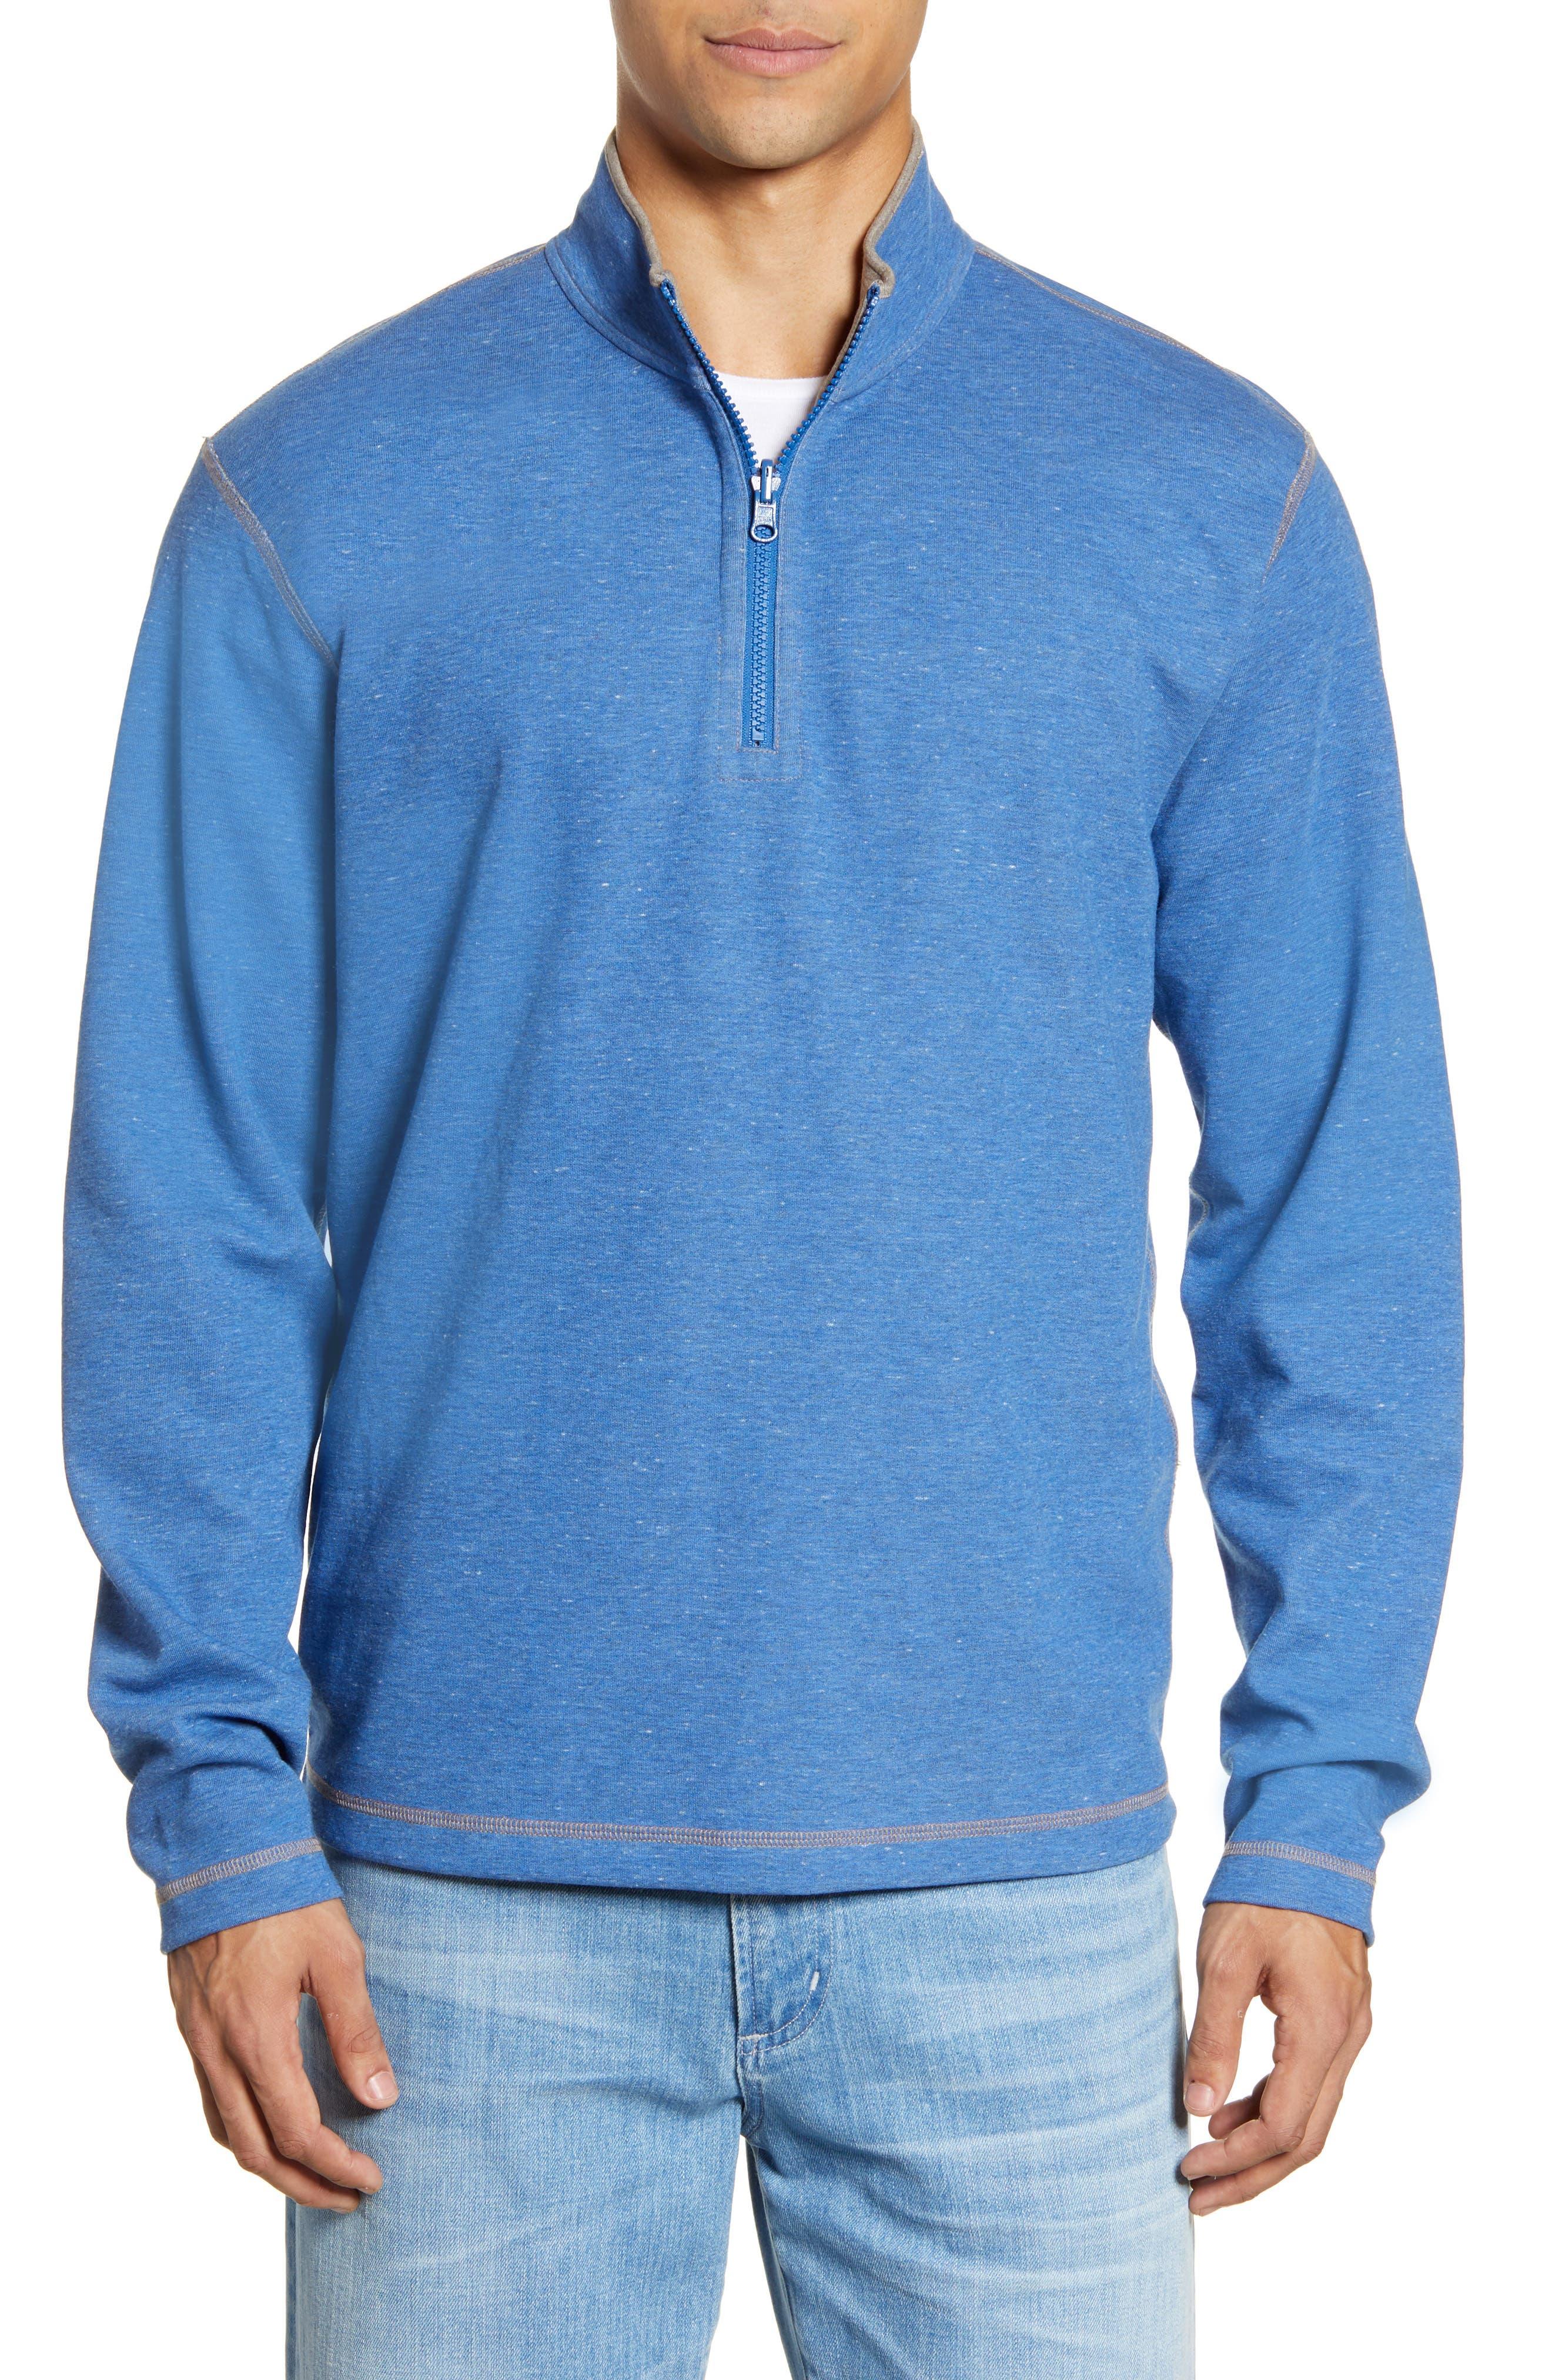 Alister Reversible Quarter Zip Pullover